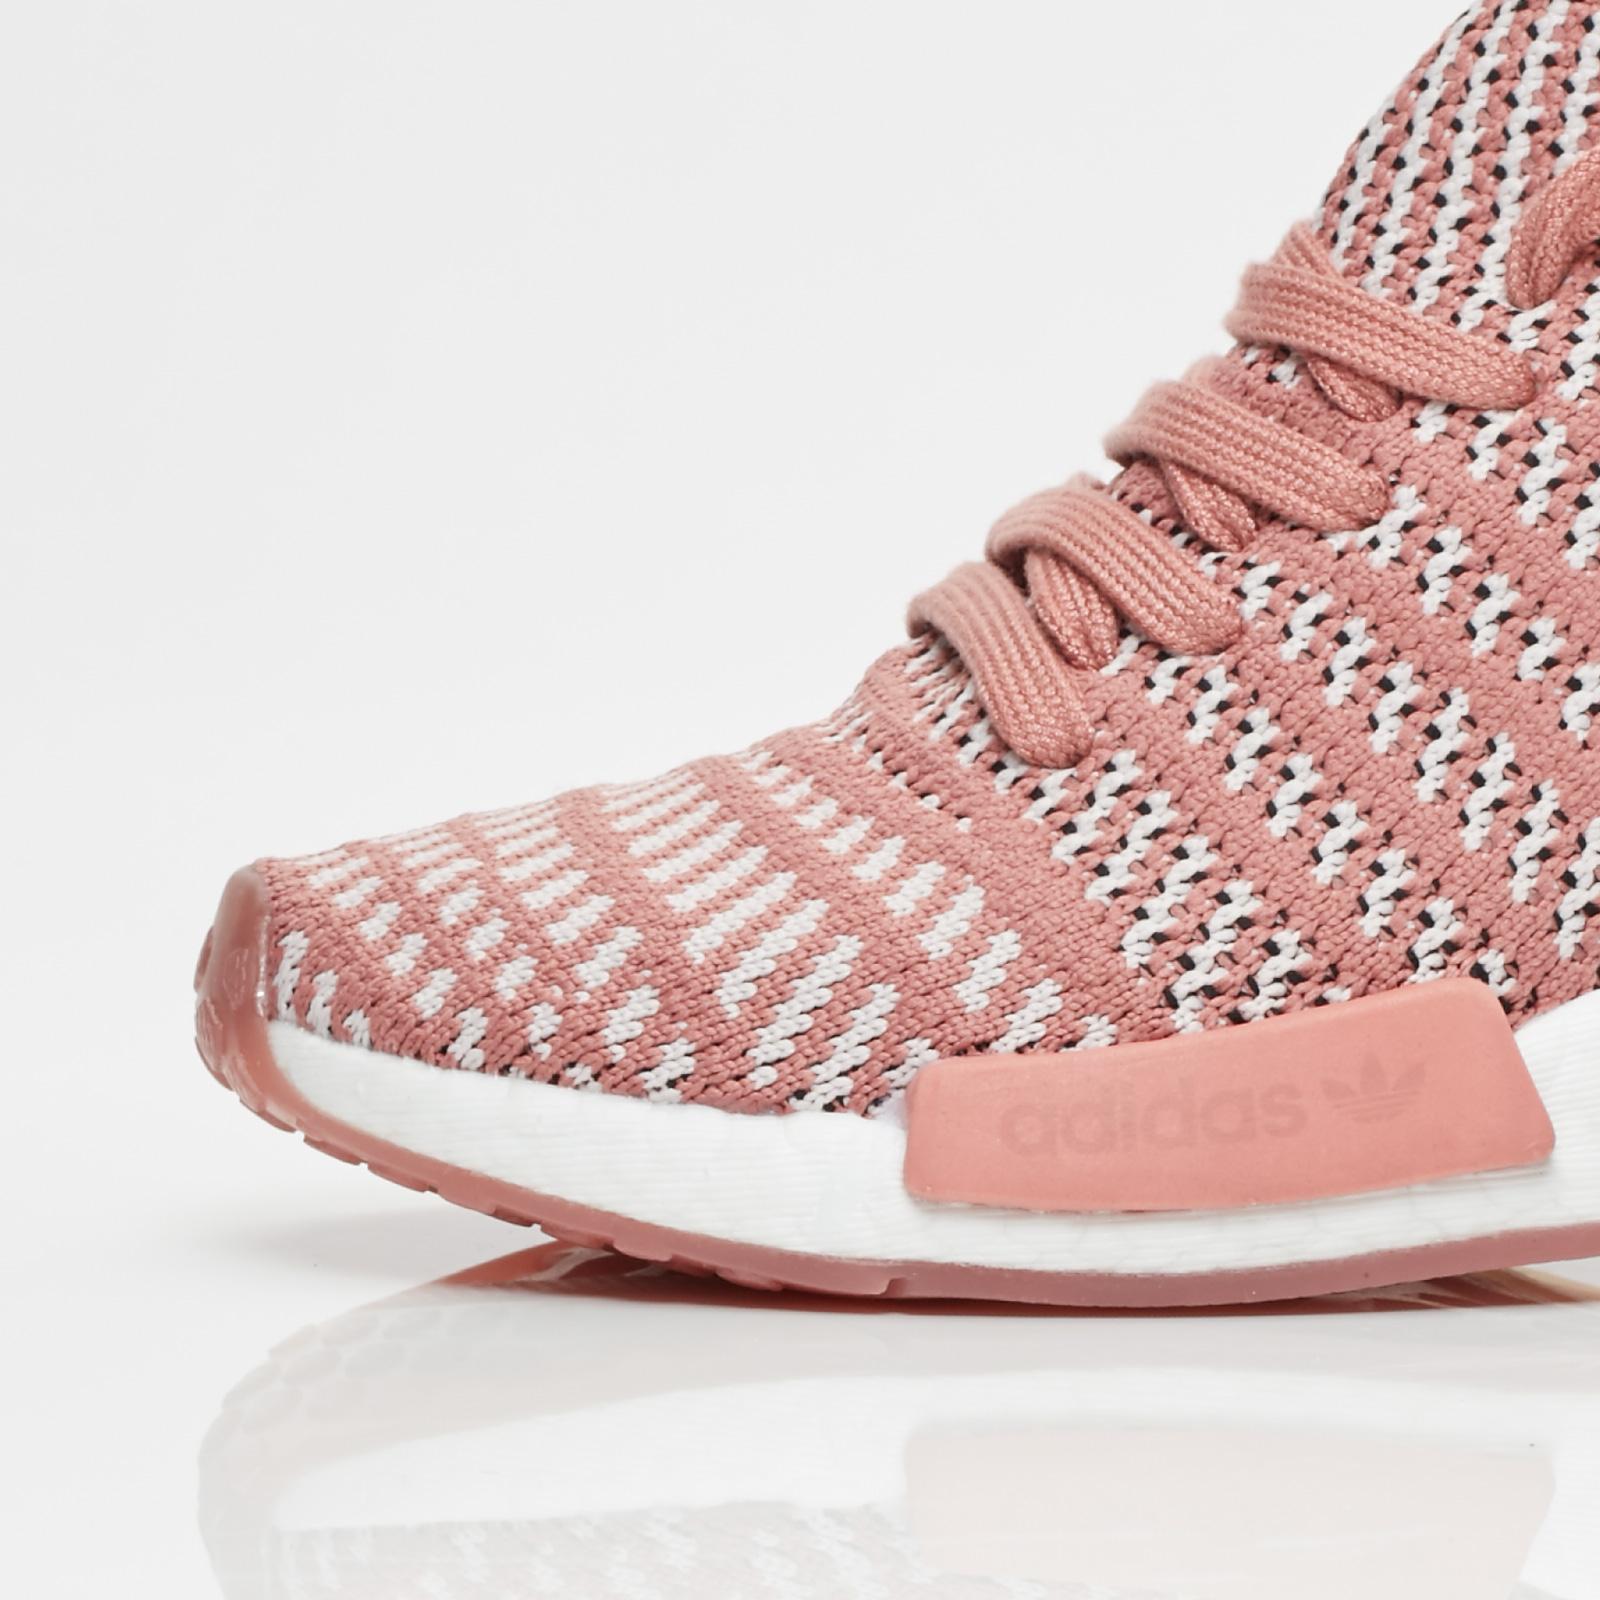 d3c7a4d3bdce6 adidas NMD R1 STLT Primeknit Womens - Cq2028 - Sneakersnstuff ...